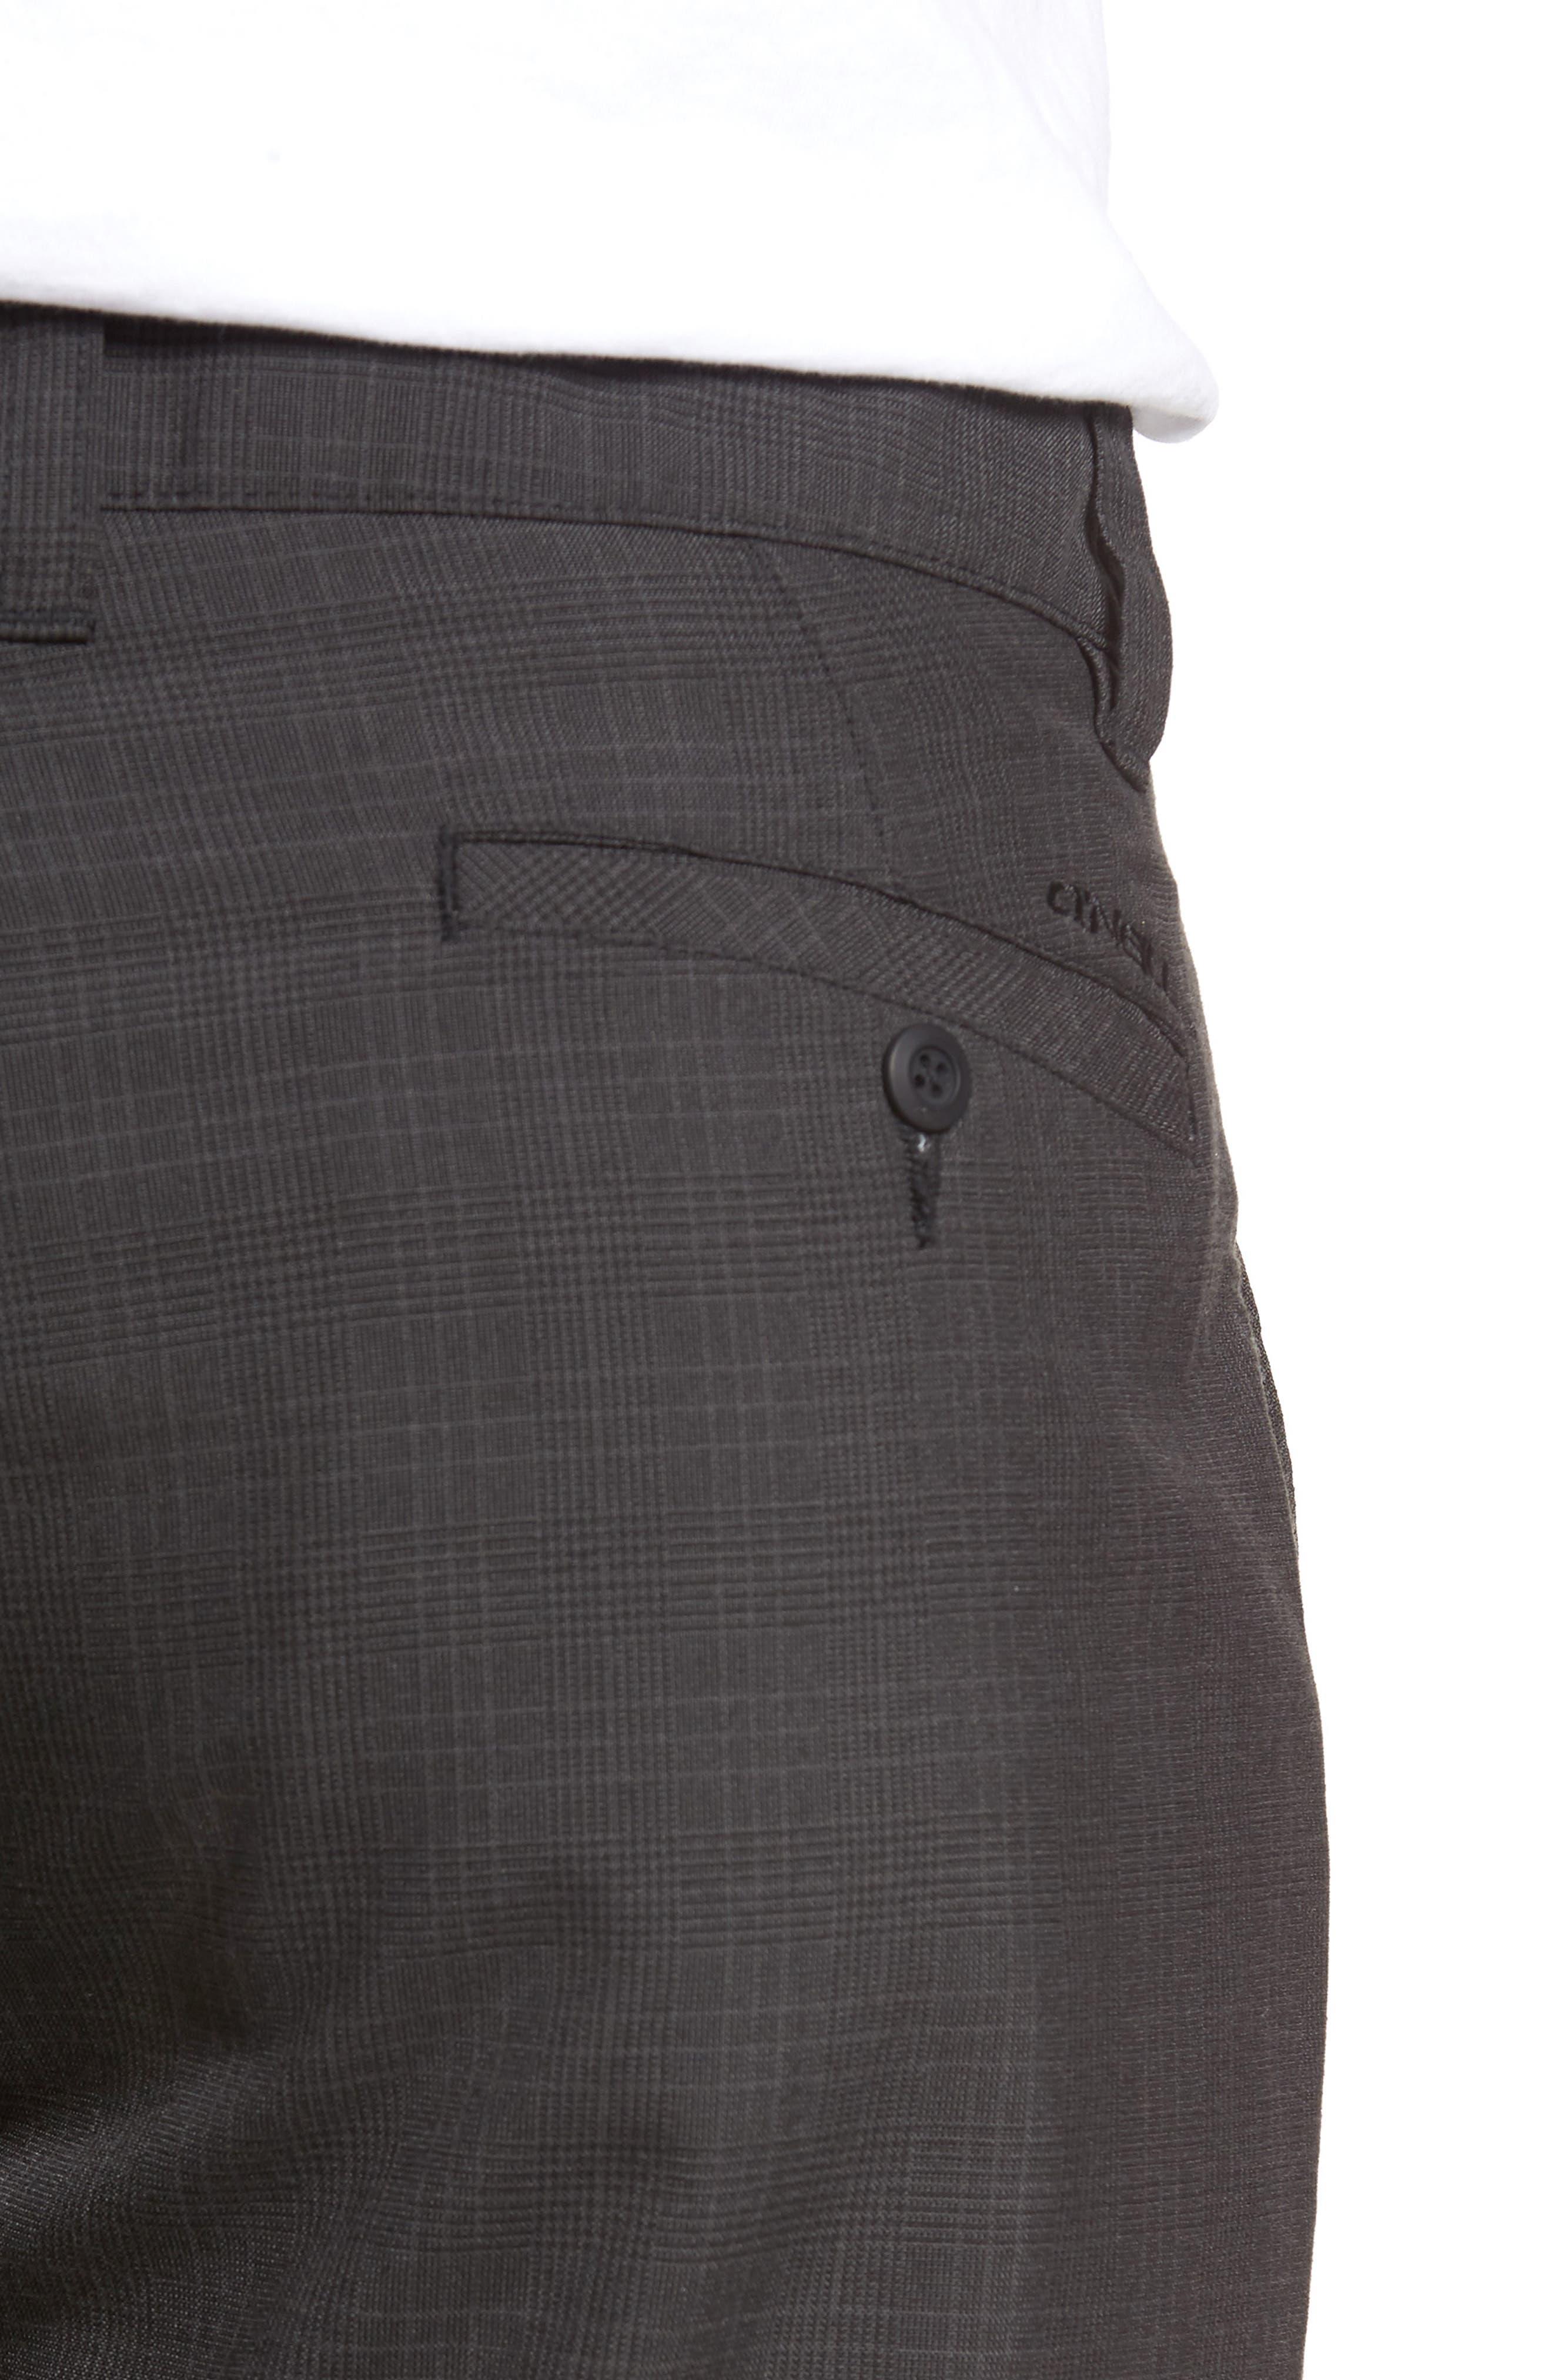 Delta Glen Plaid Shorts,                             Alternate thumbnail 4, color,                             Black